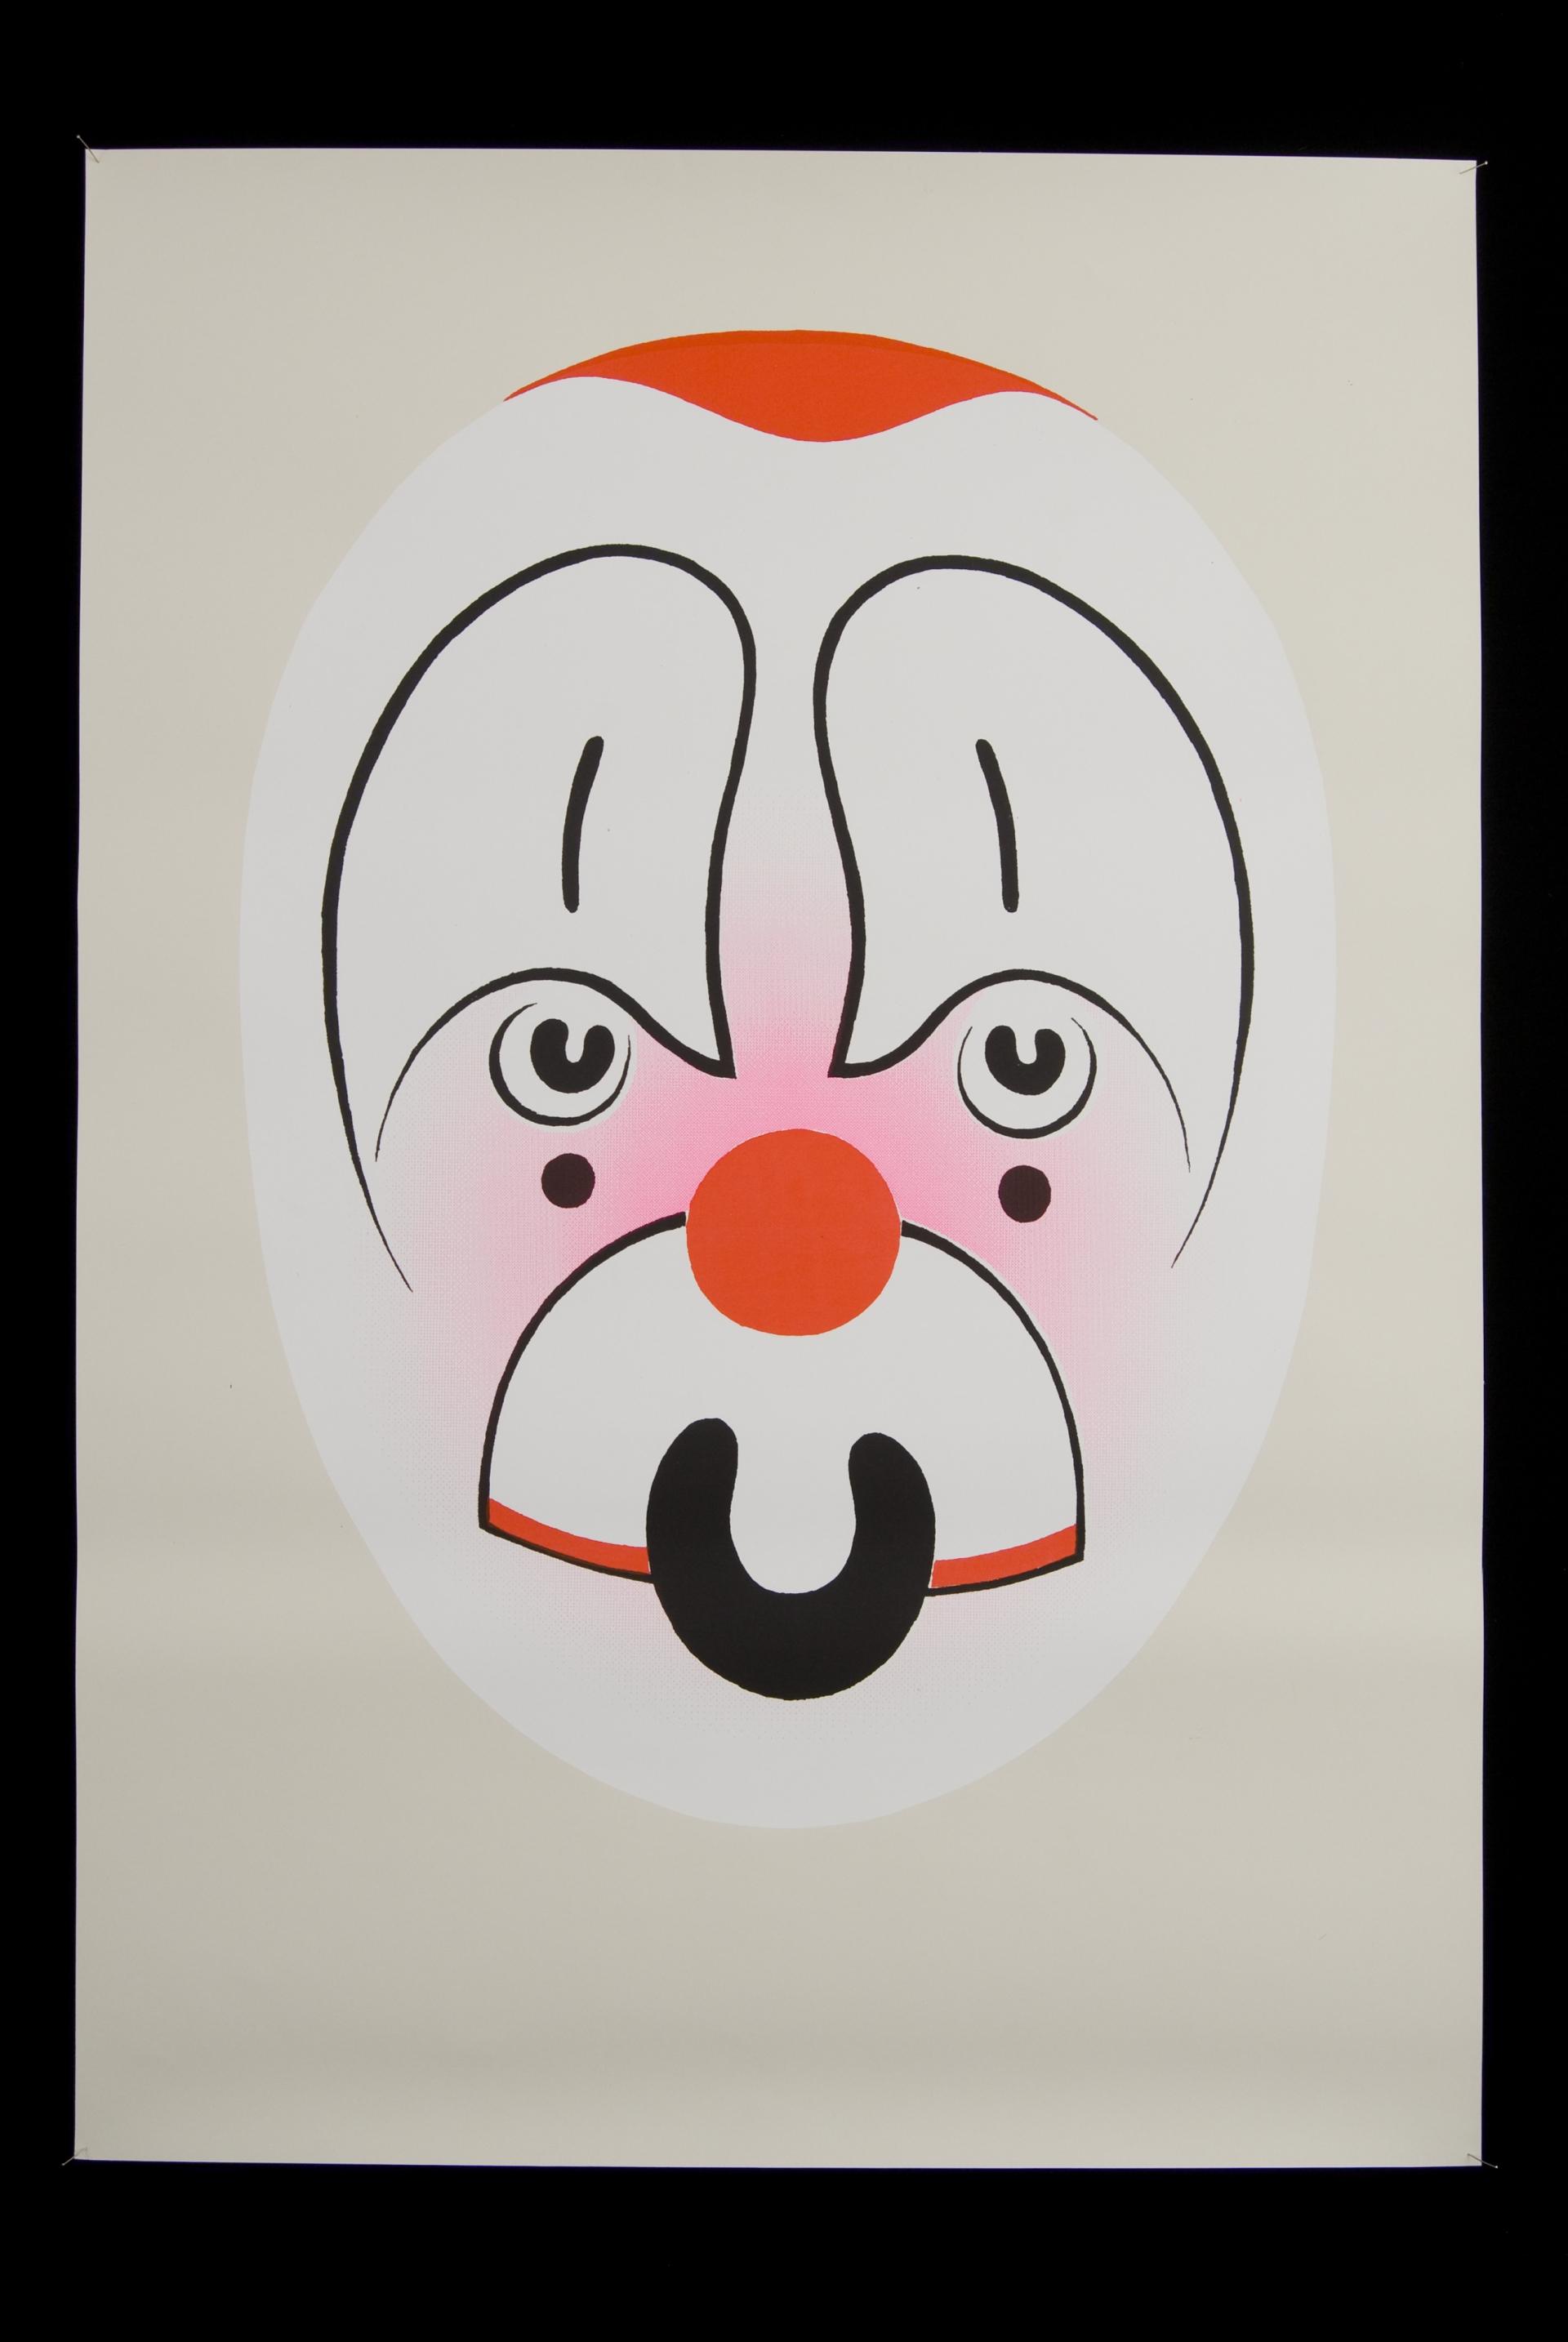 Molly Kyhl clowns